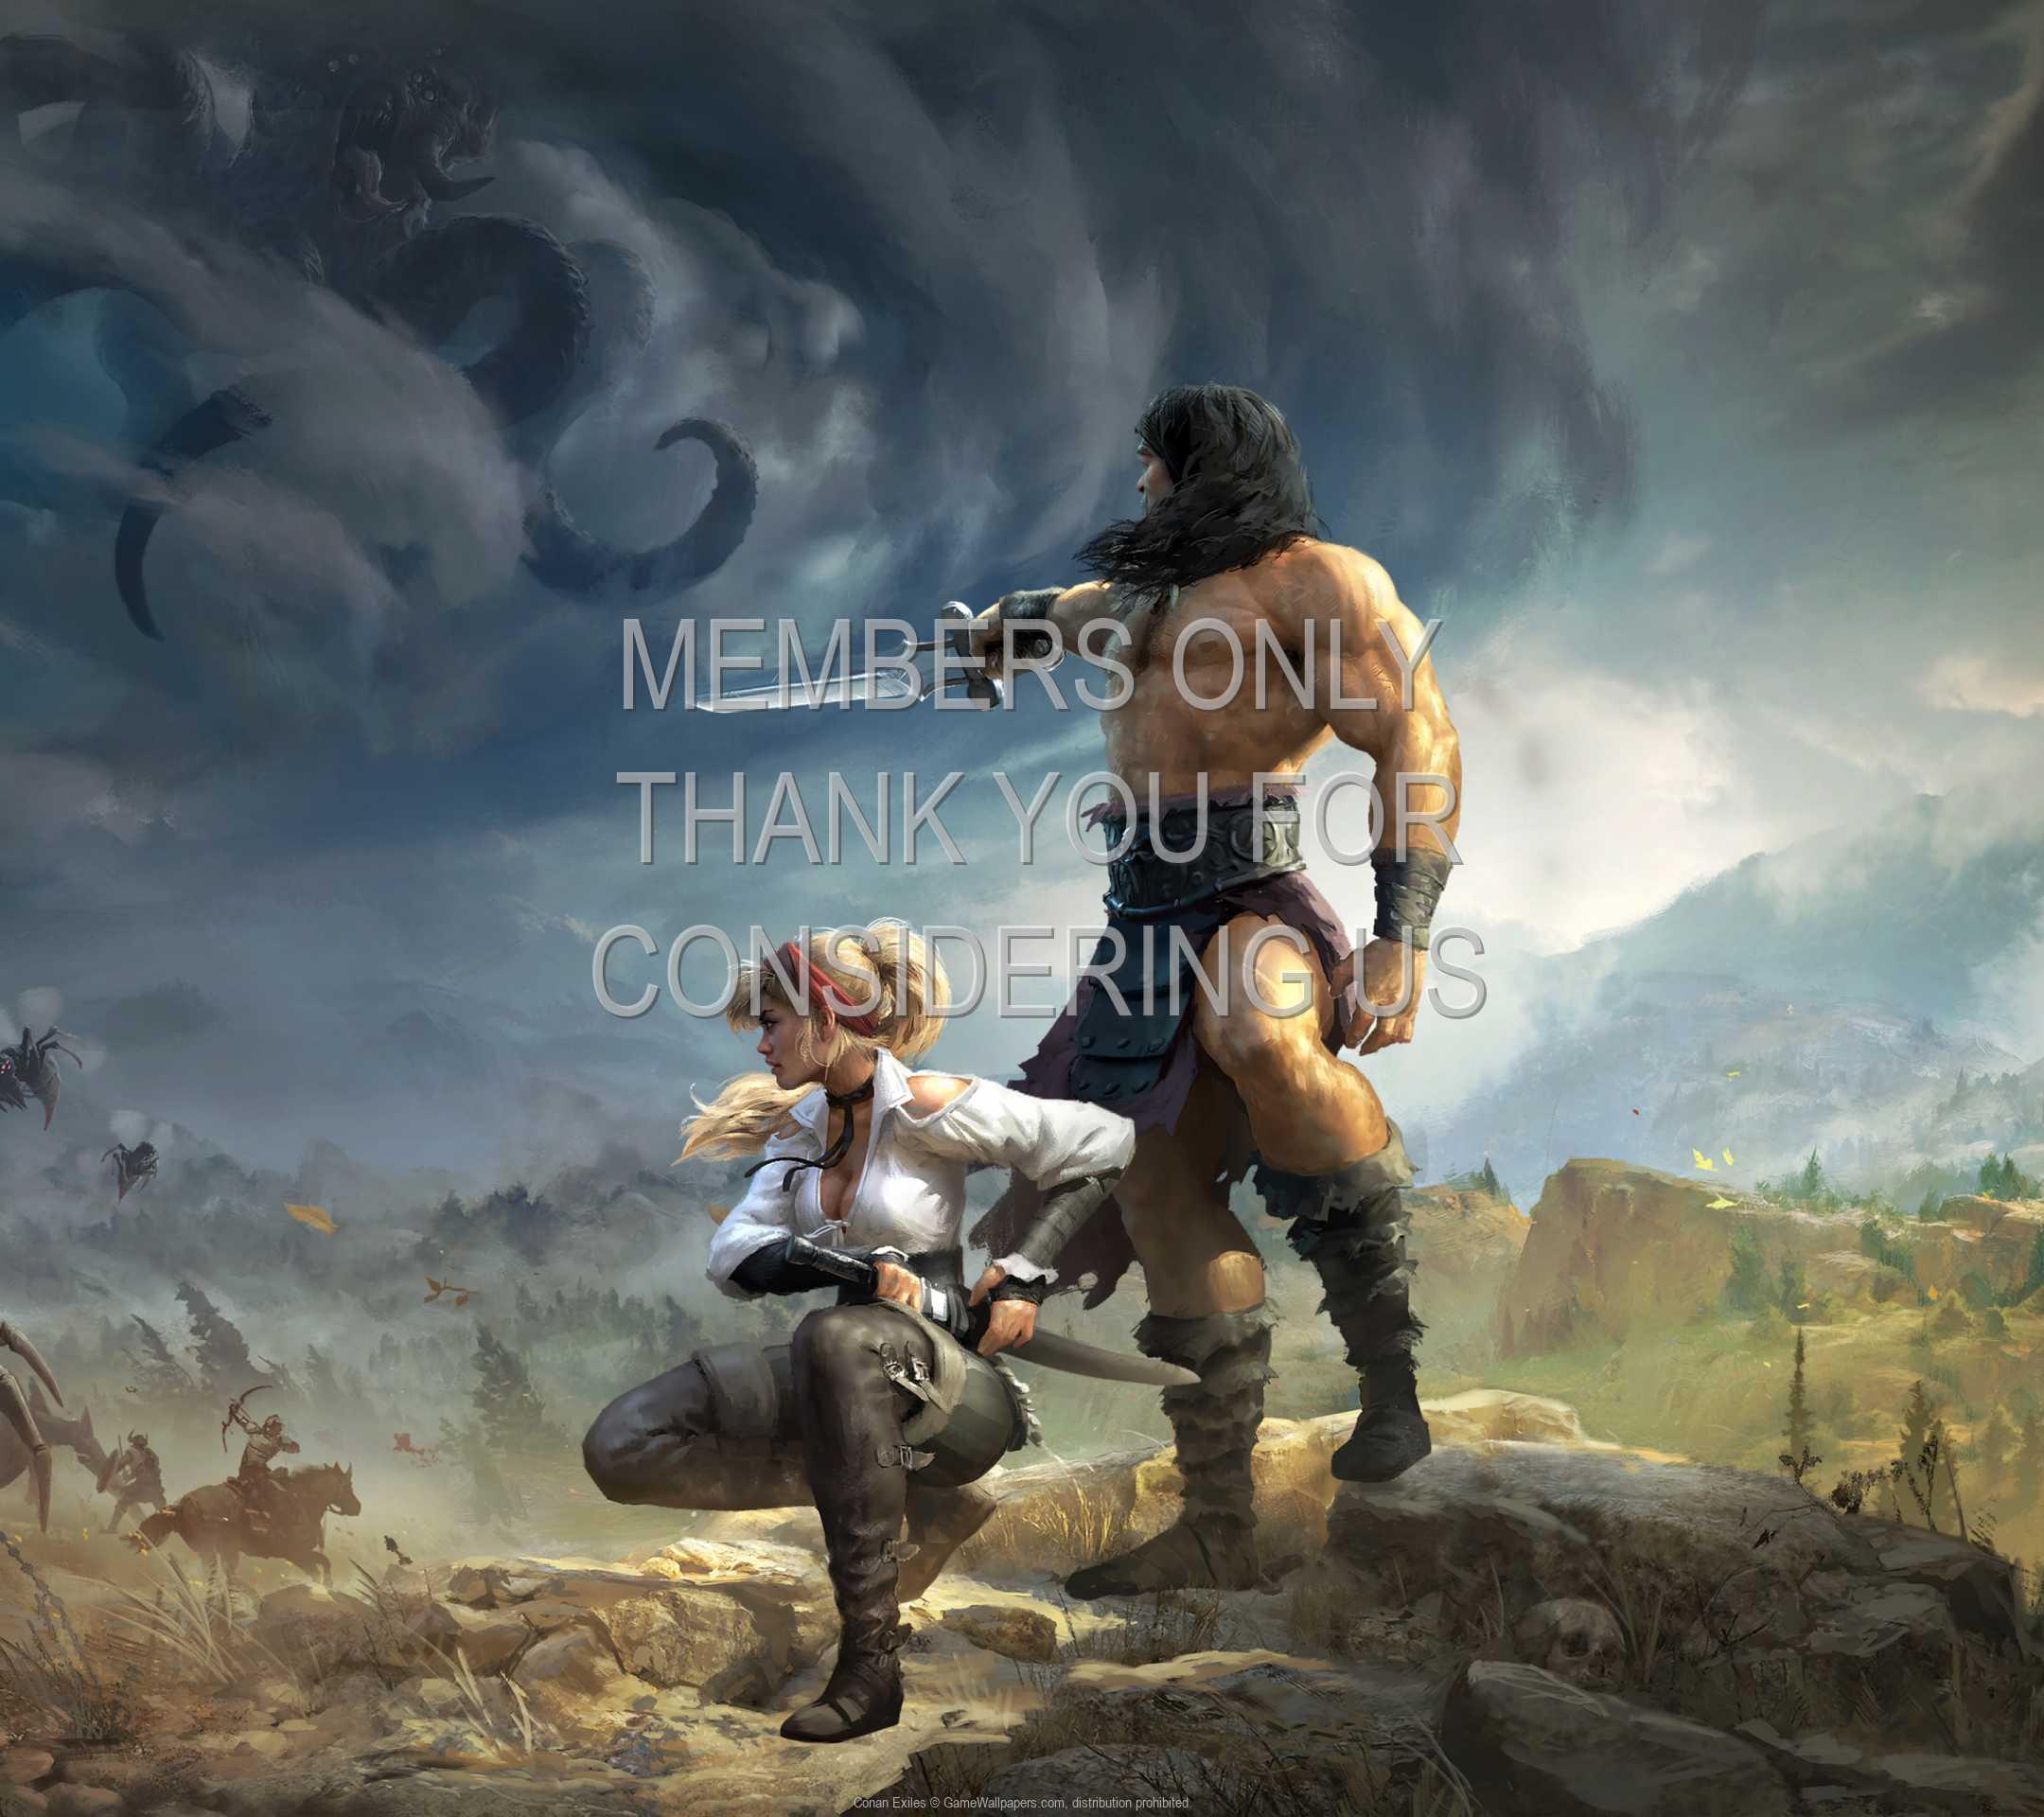 Conan Exiles 1080p Horizontal Mobile wallpaper or background 02